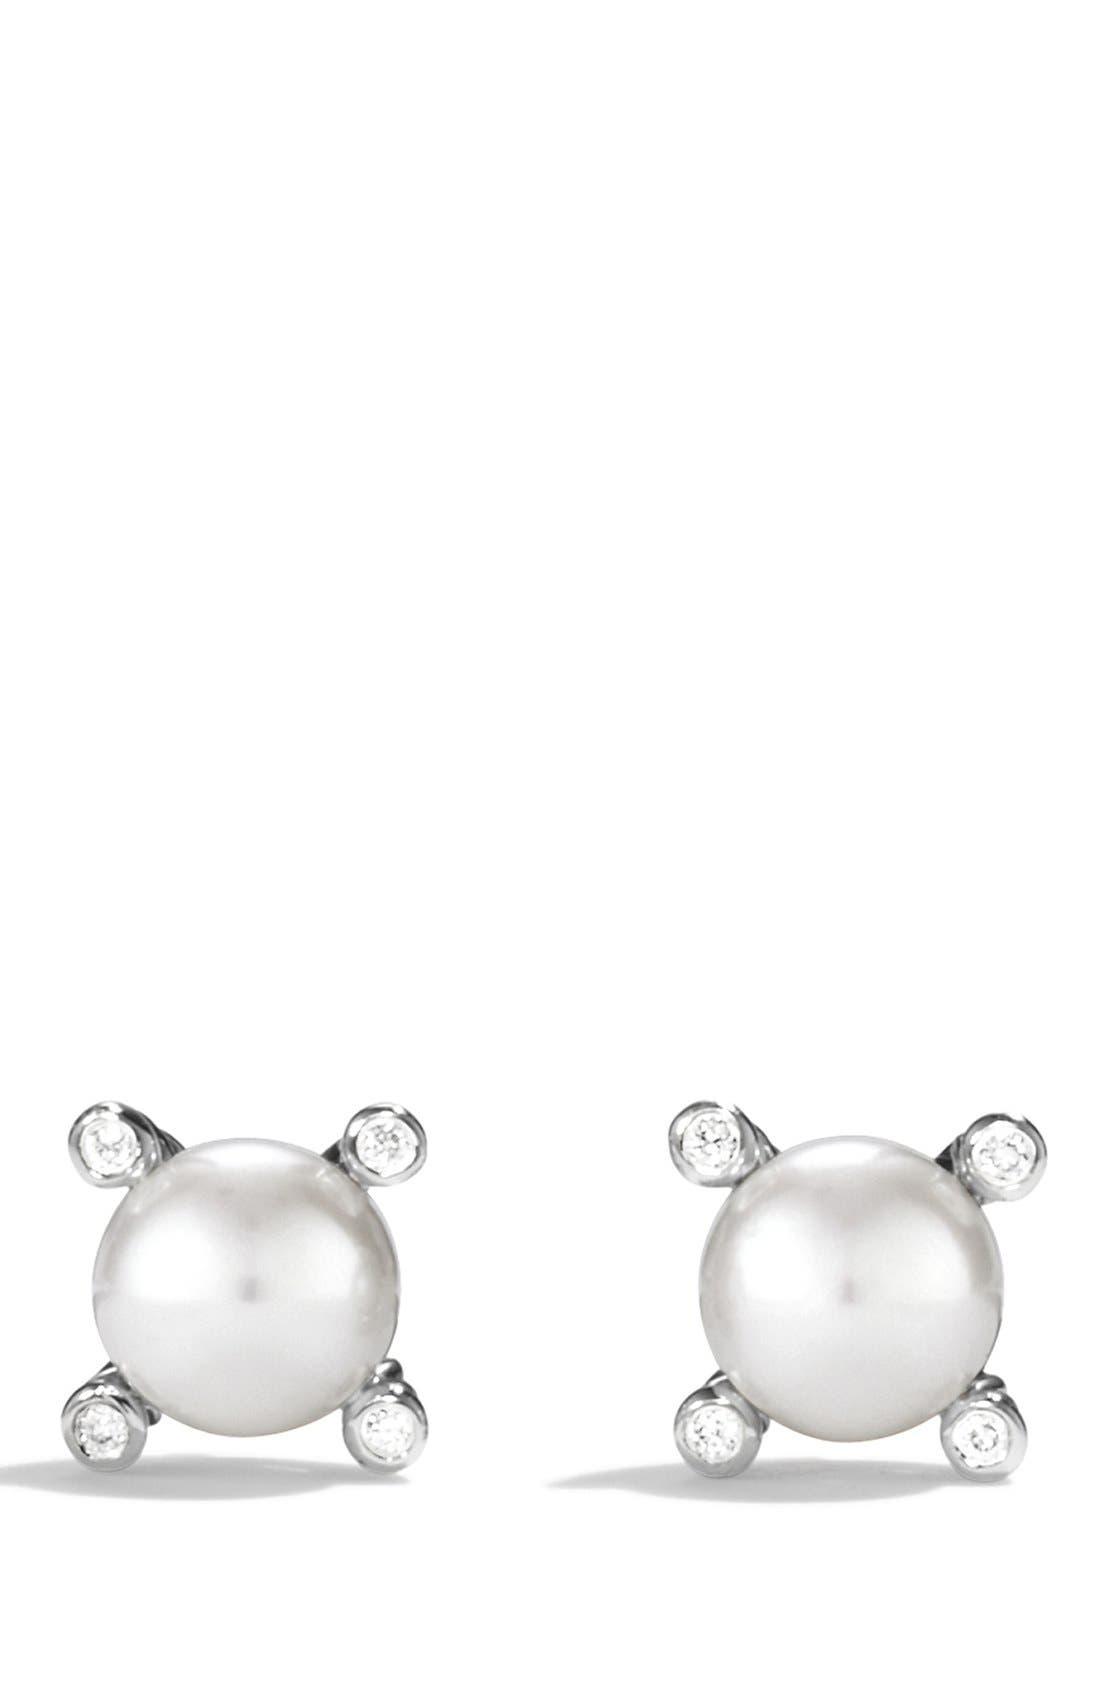 DAVID YURMAN, Small Pearl Earrings with Diamonds, Main thumbnail 1, color, PEARL